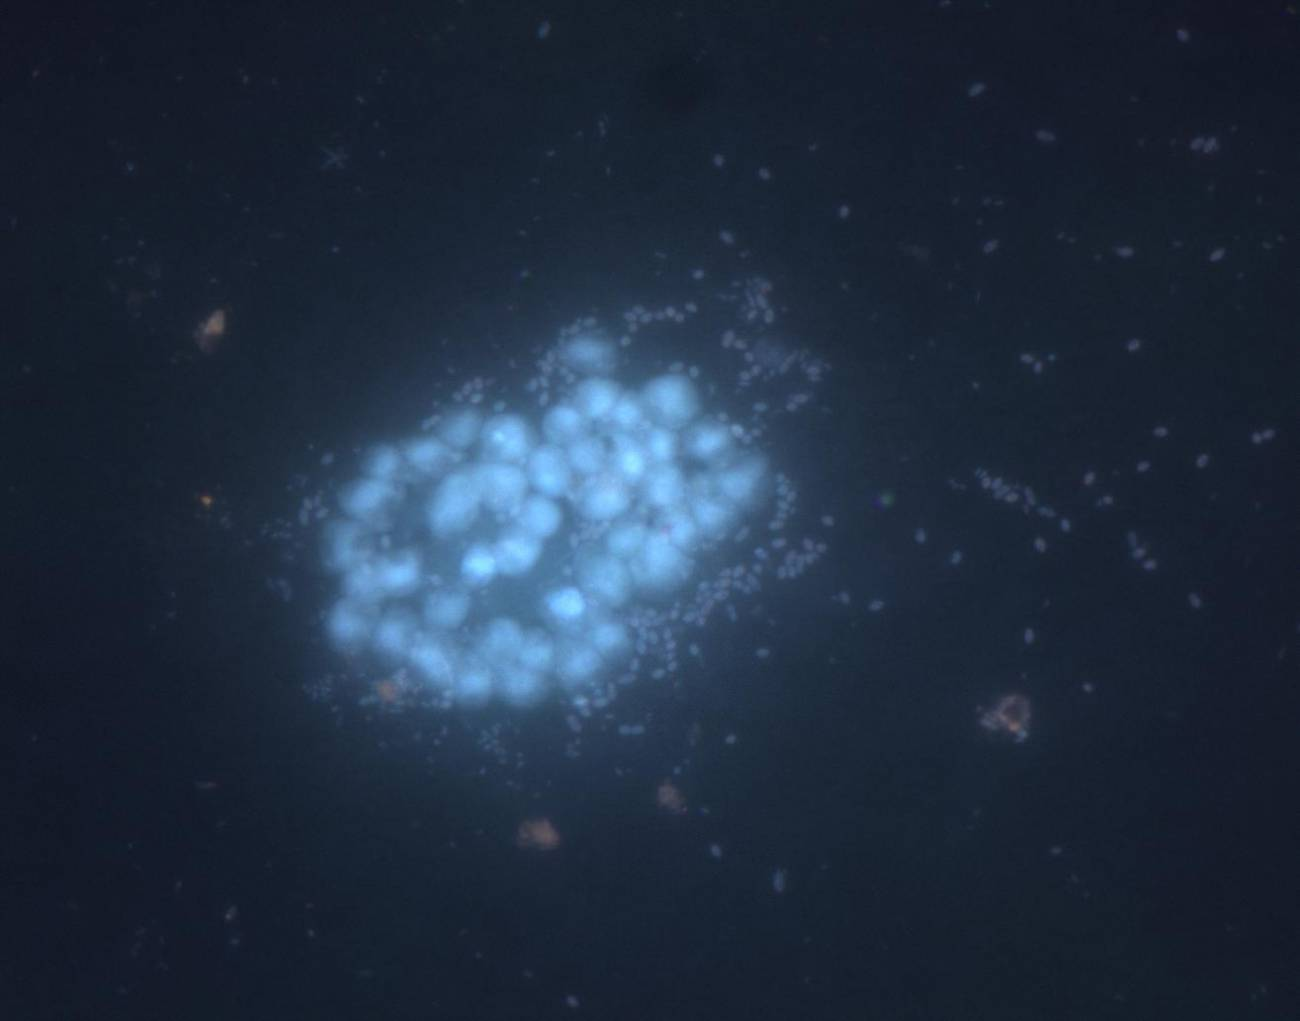 Imagen de microscopio de epifluorescencia conteniendo diferentes morfologías microscópicas no identificadas presentes en las saladas de Monegros. Crédito: A Pena-Baixeras. / CSIC.